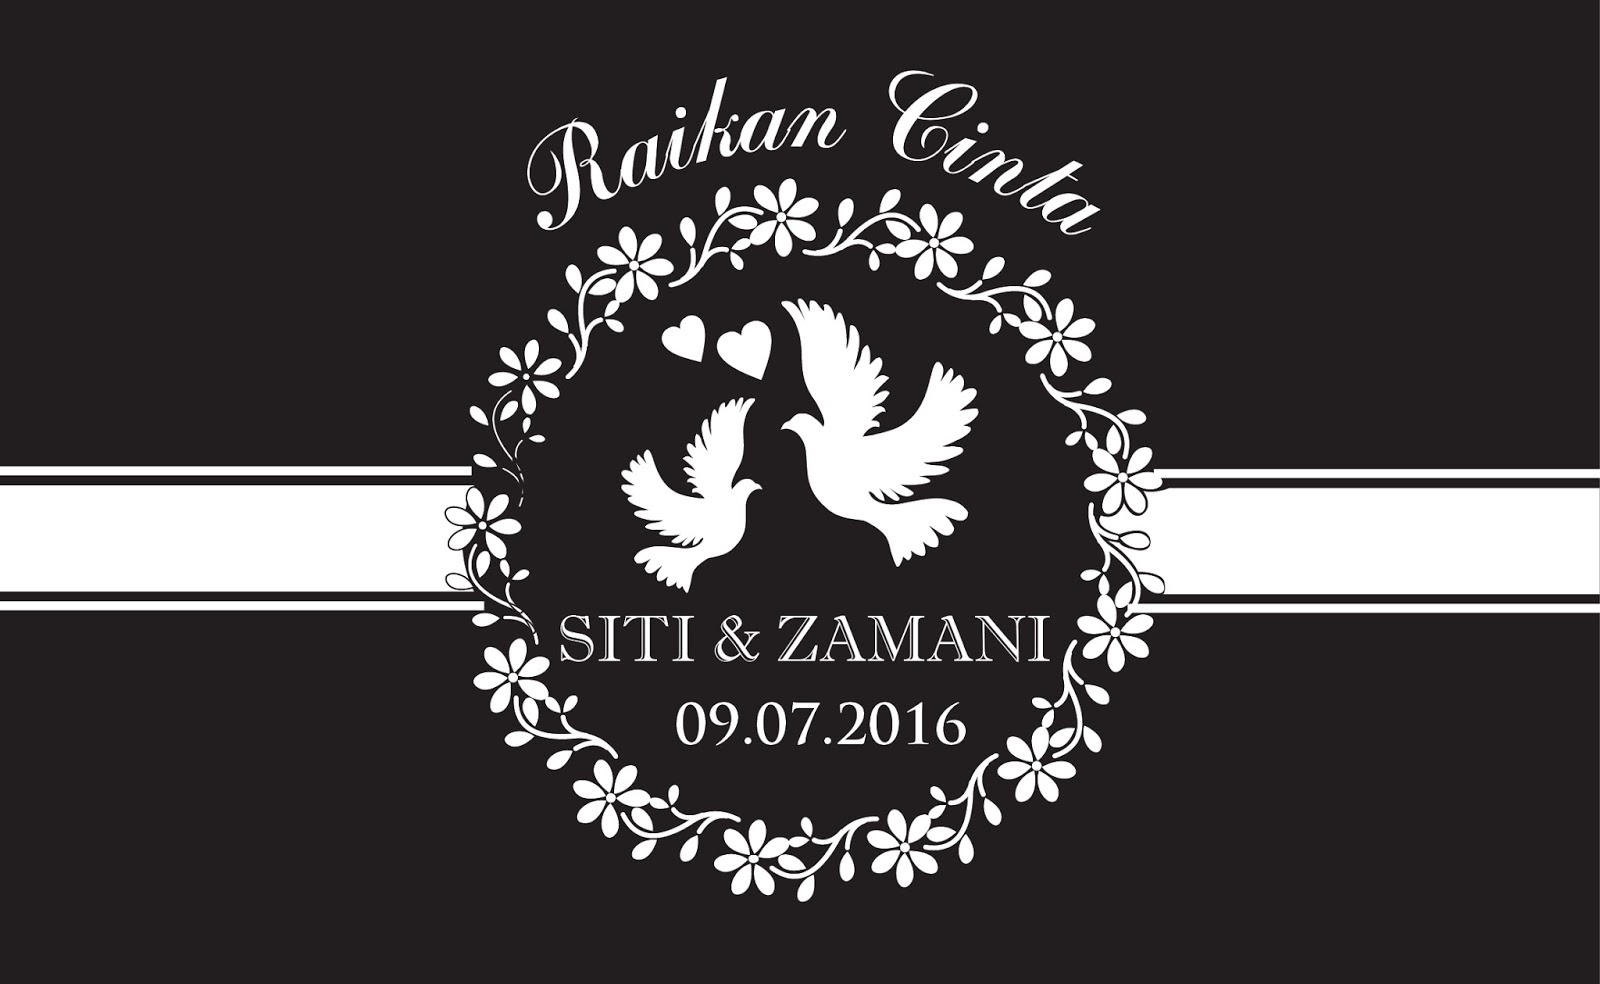 Kiz Wedding Contoh Design Kad Kahwin Terbaru Siti Dan Zamani